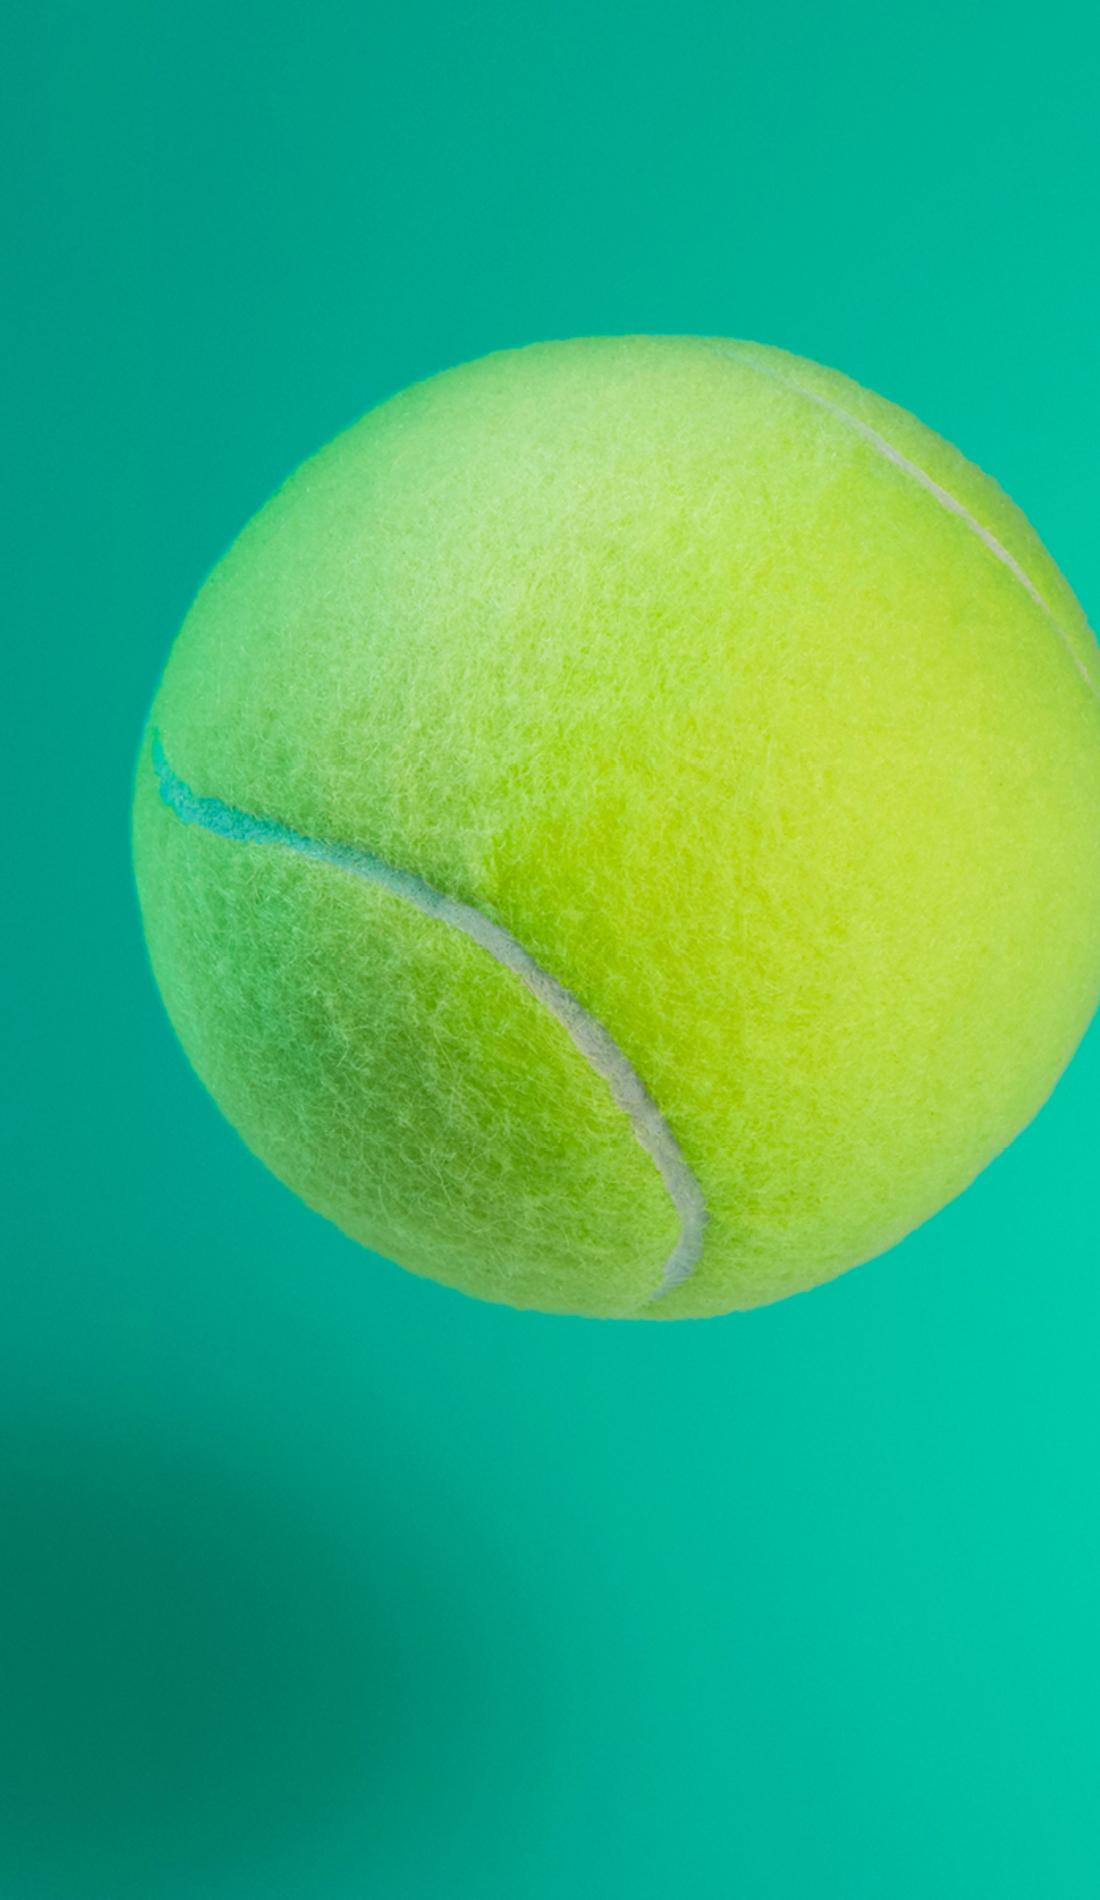 A National Bank Open - ATP Men's Tennis live event